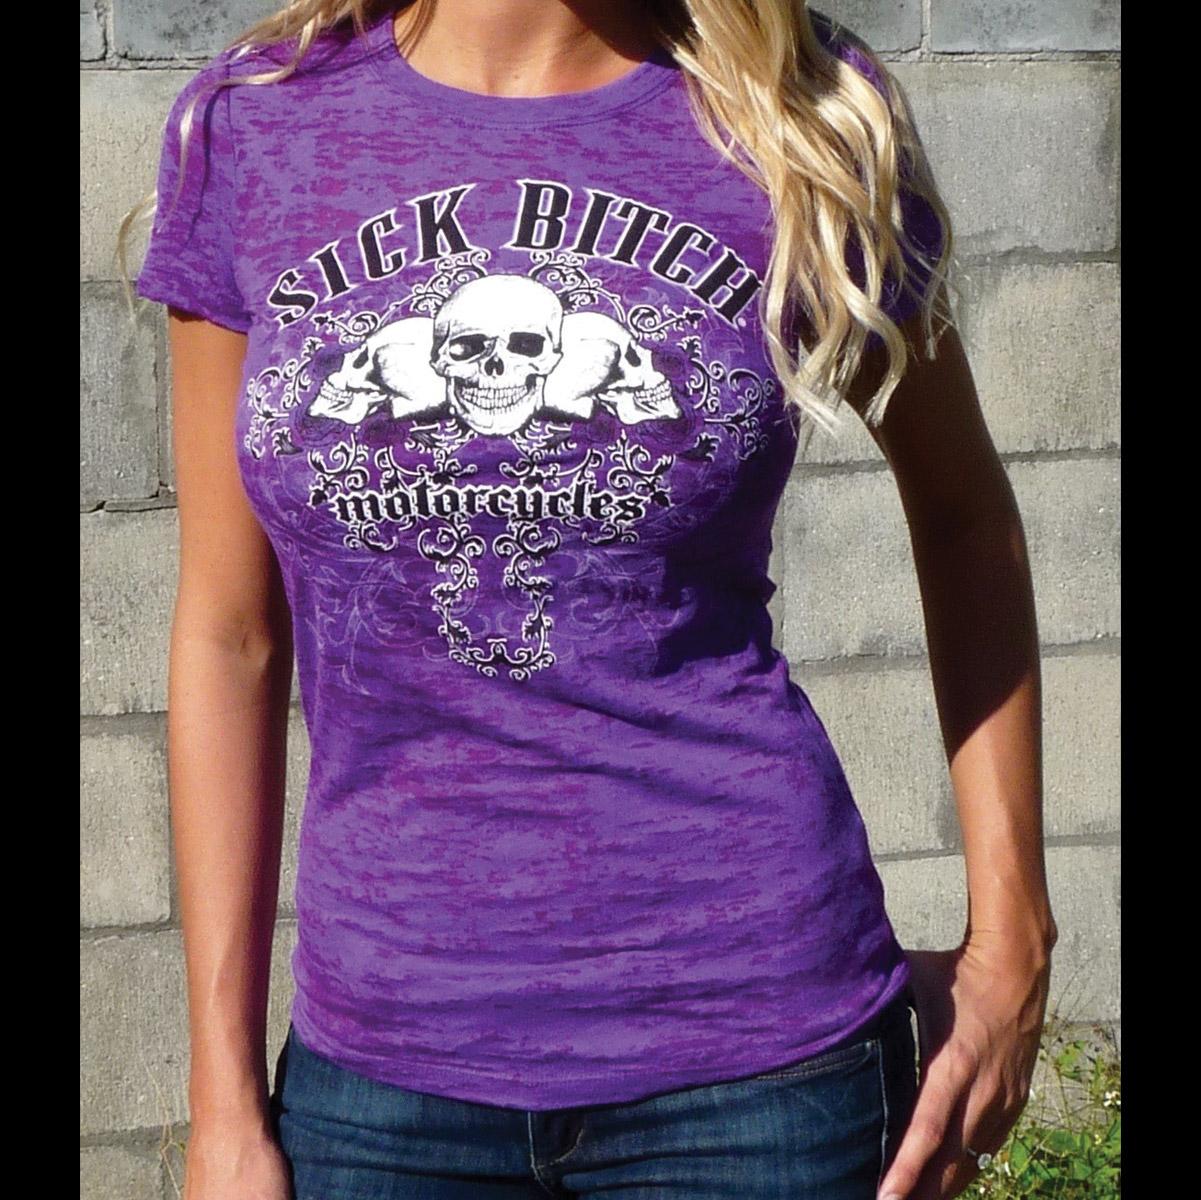 Sick Boy Sick Bitch Women's Purple Burnout T-Shirt